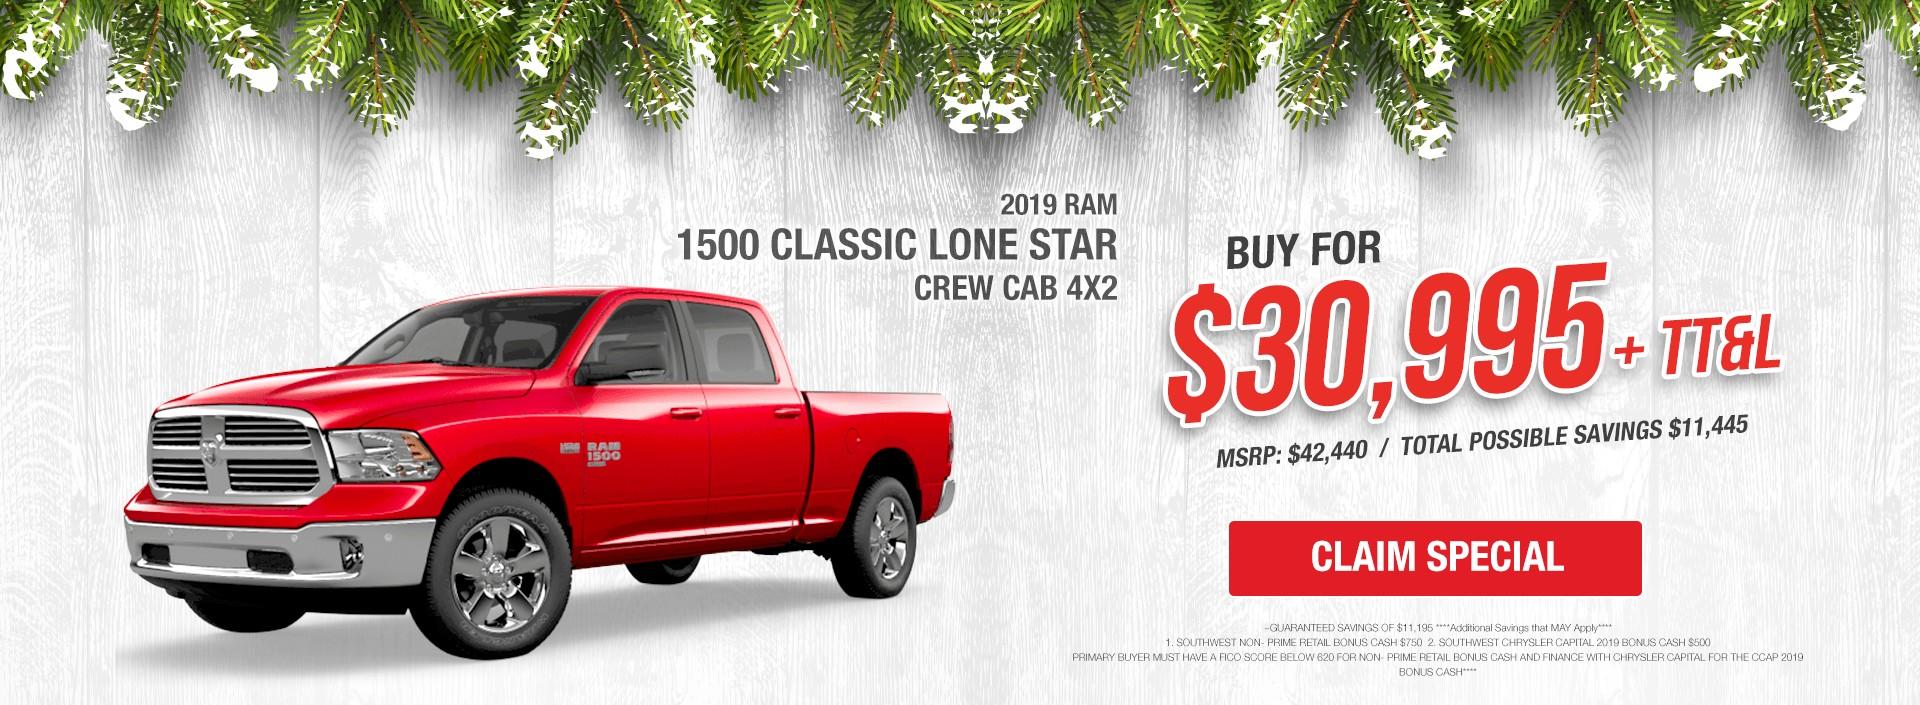 January RAM 1500 Lone Star